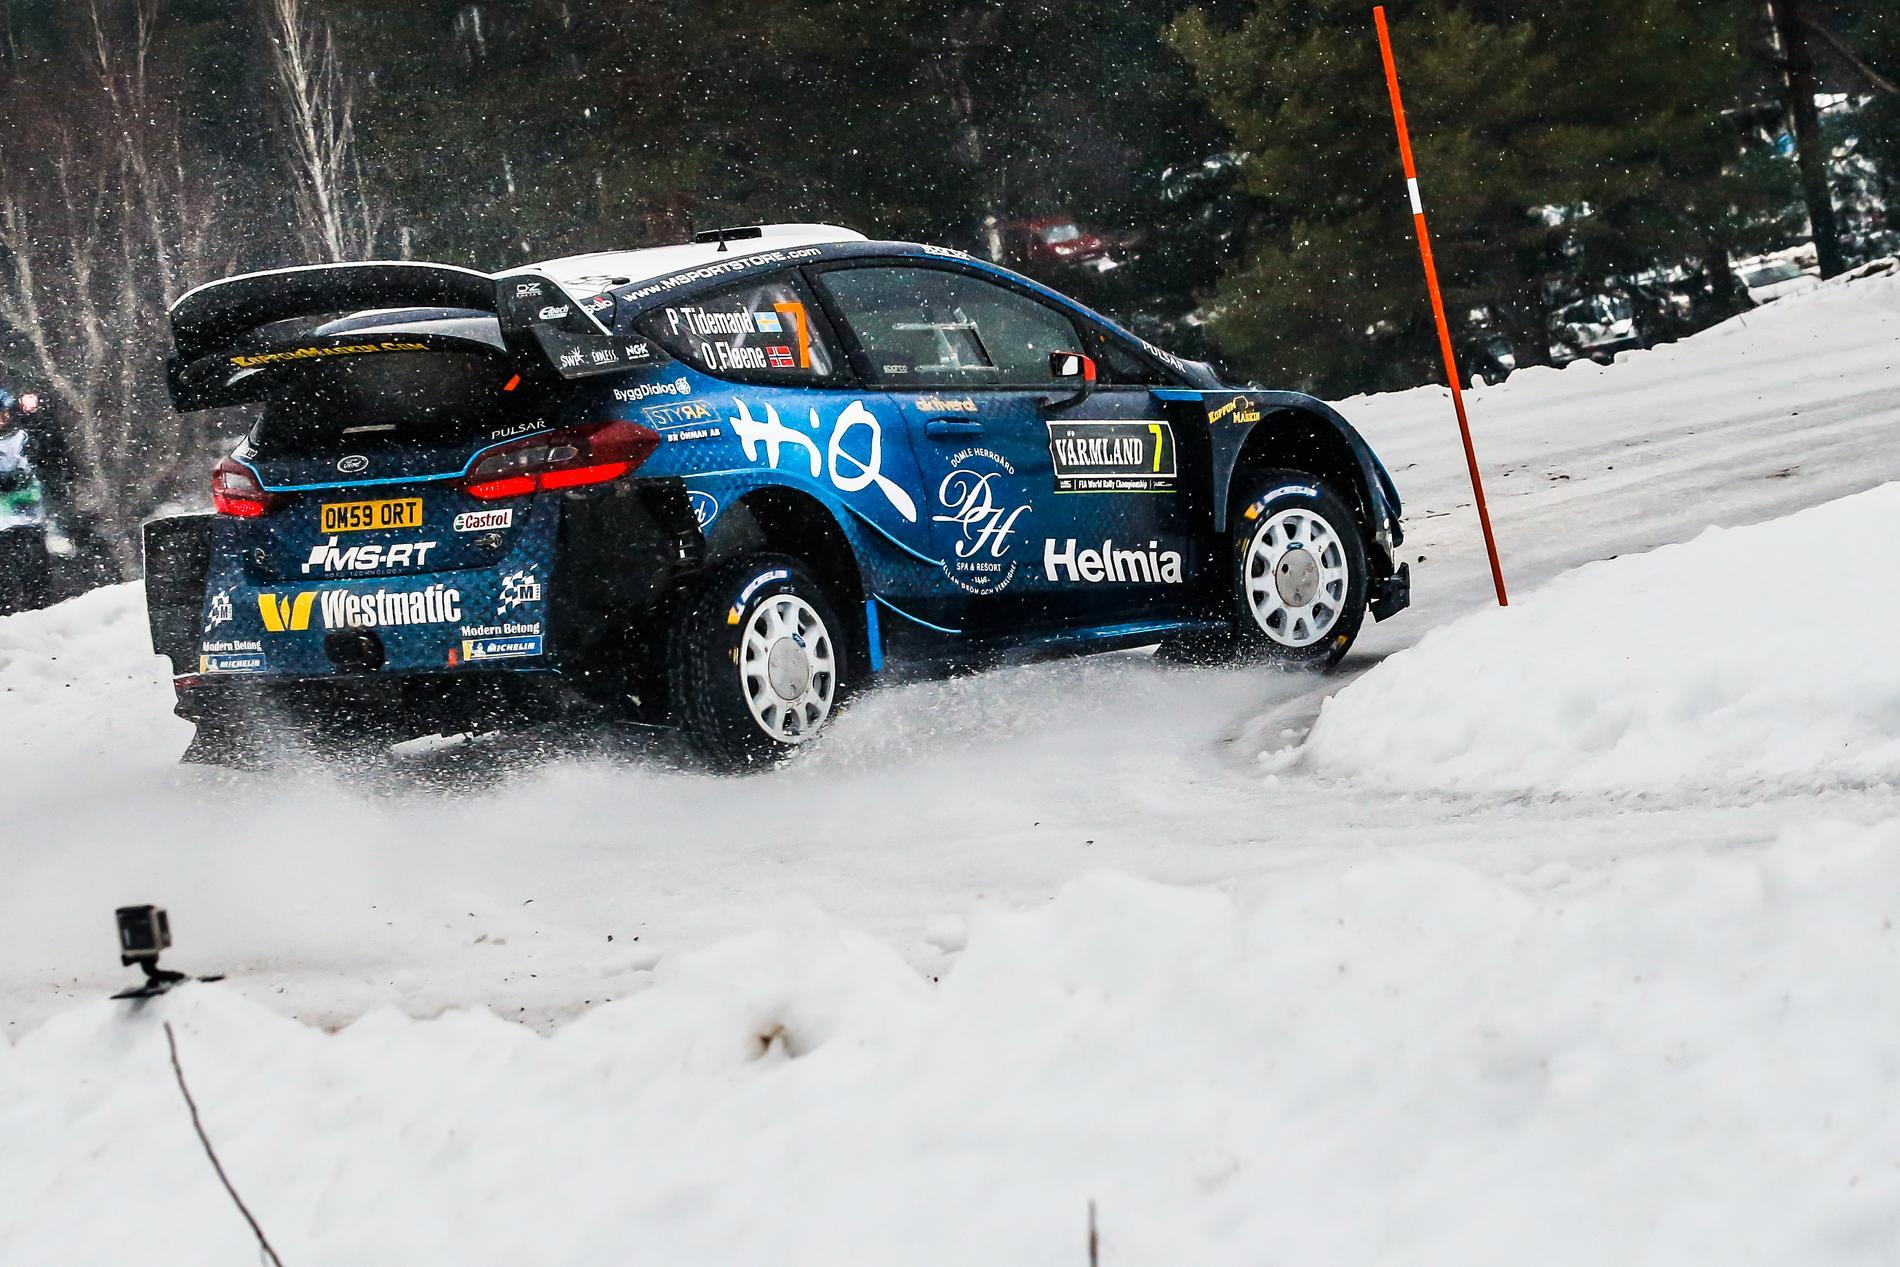 Ott Tänak leder Rally Sweden 2019, Pontus Tidemand  avancerar